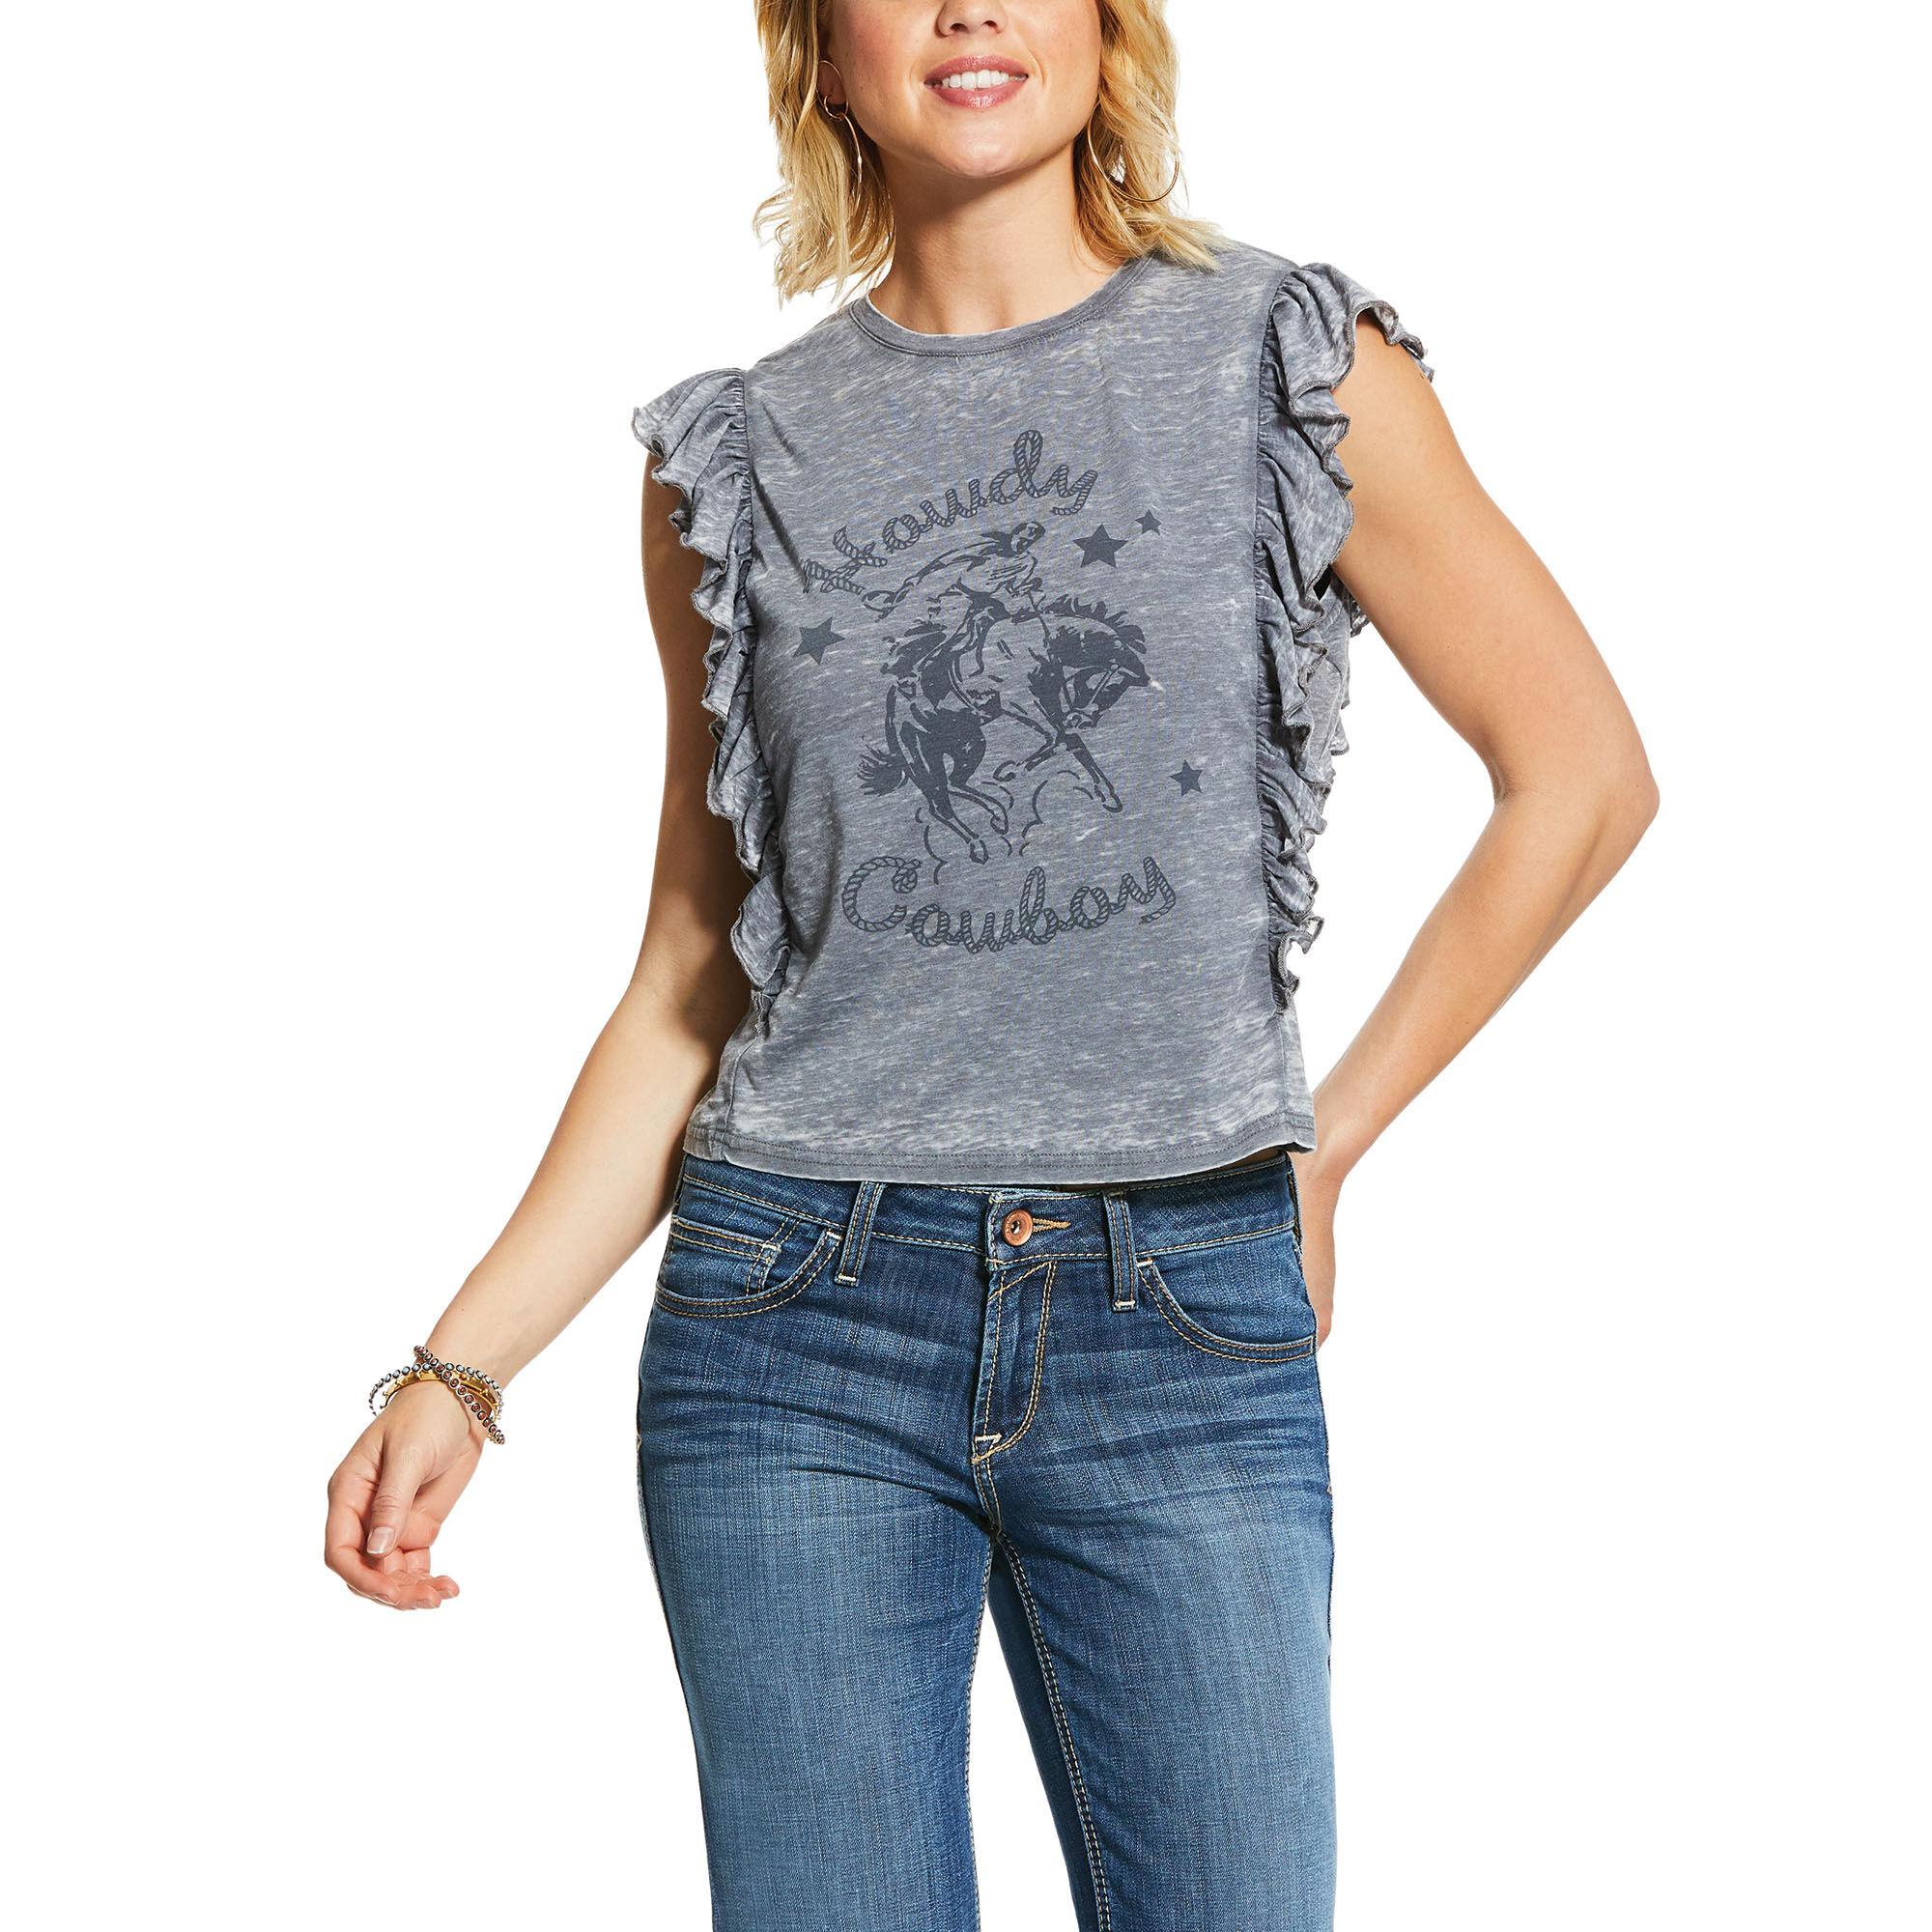 Ariat 10030881 Ladies Ariat Howdy Cowboy Sleeveless Shirt